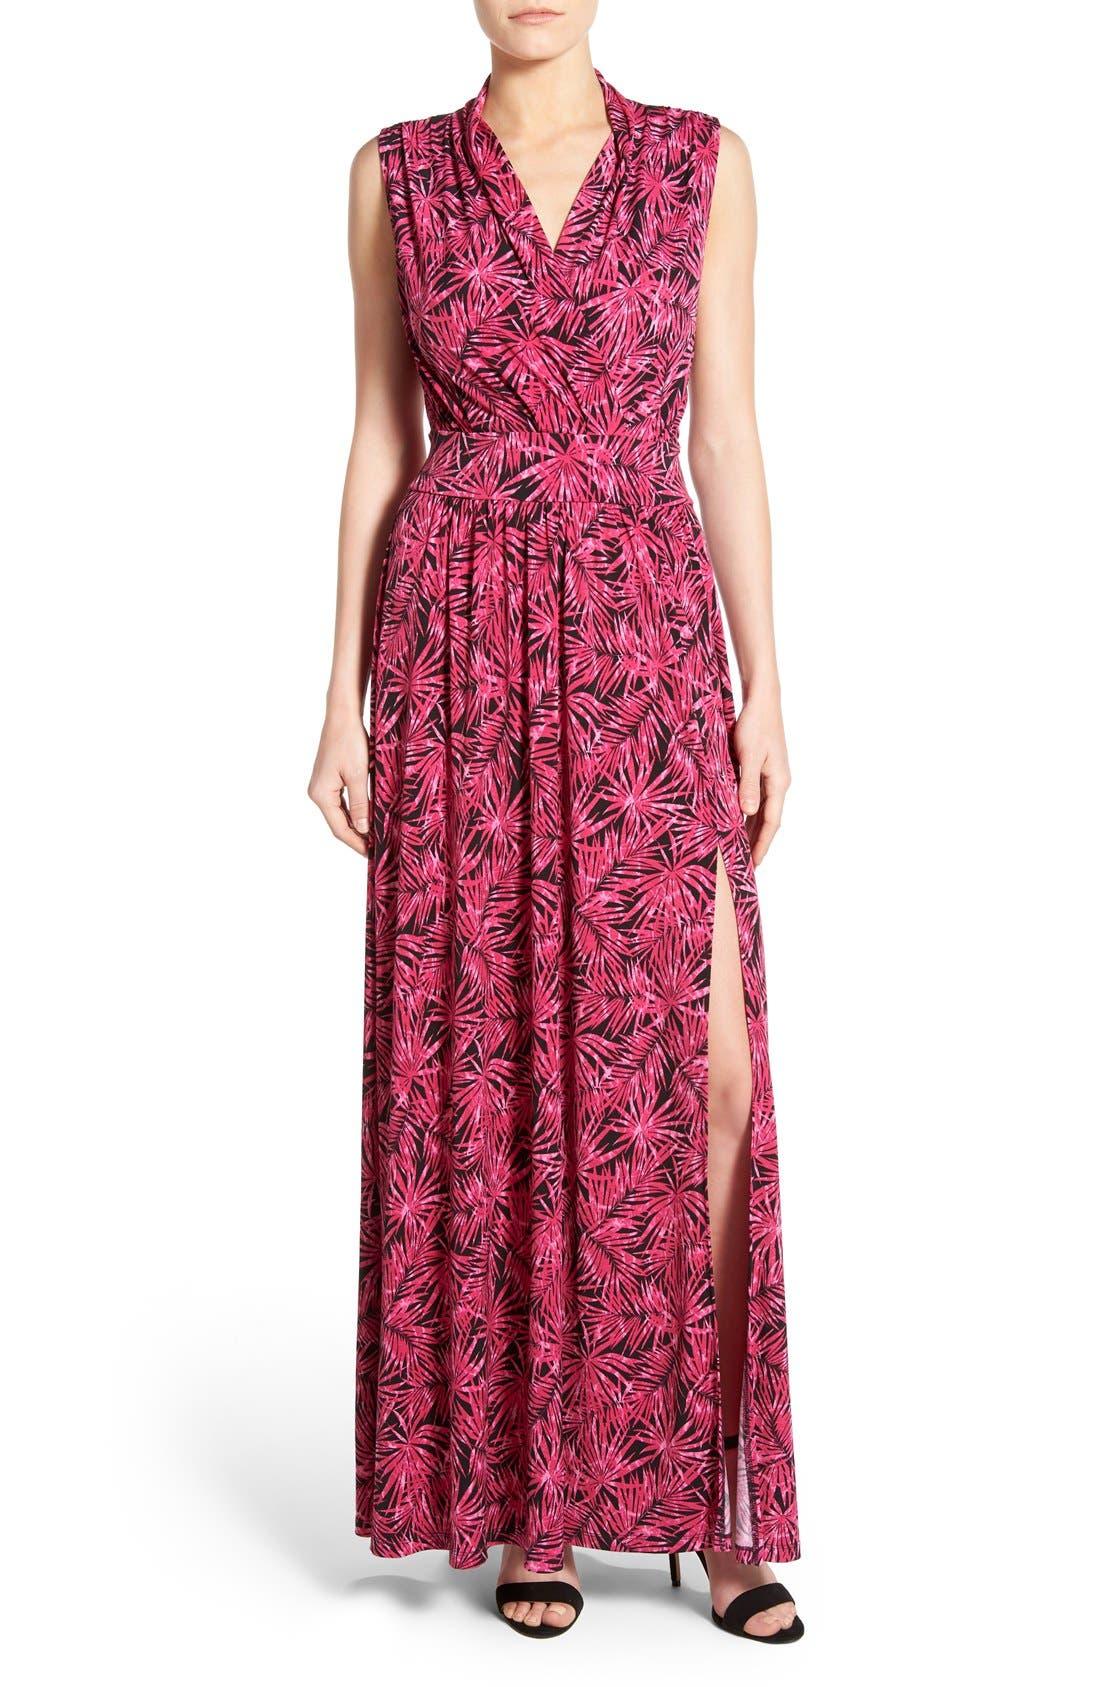 MICHAEL MICHAEL KORS, Print Jersey Side Slit Maxi Dress, Main thumbnail 1, color, 660